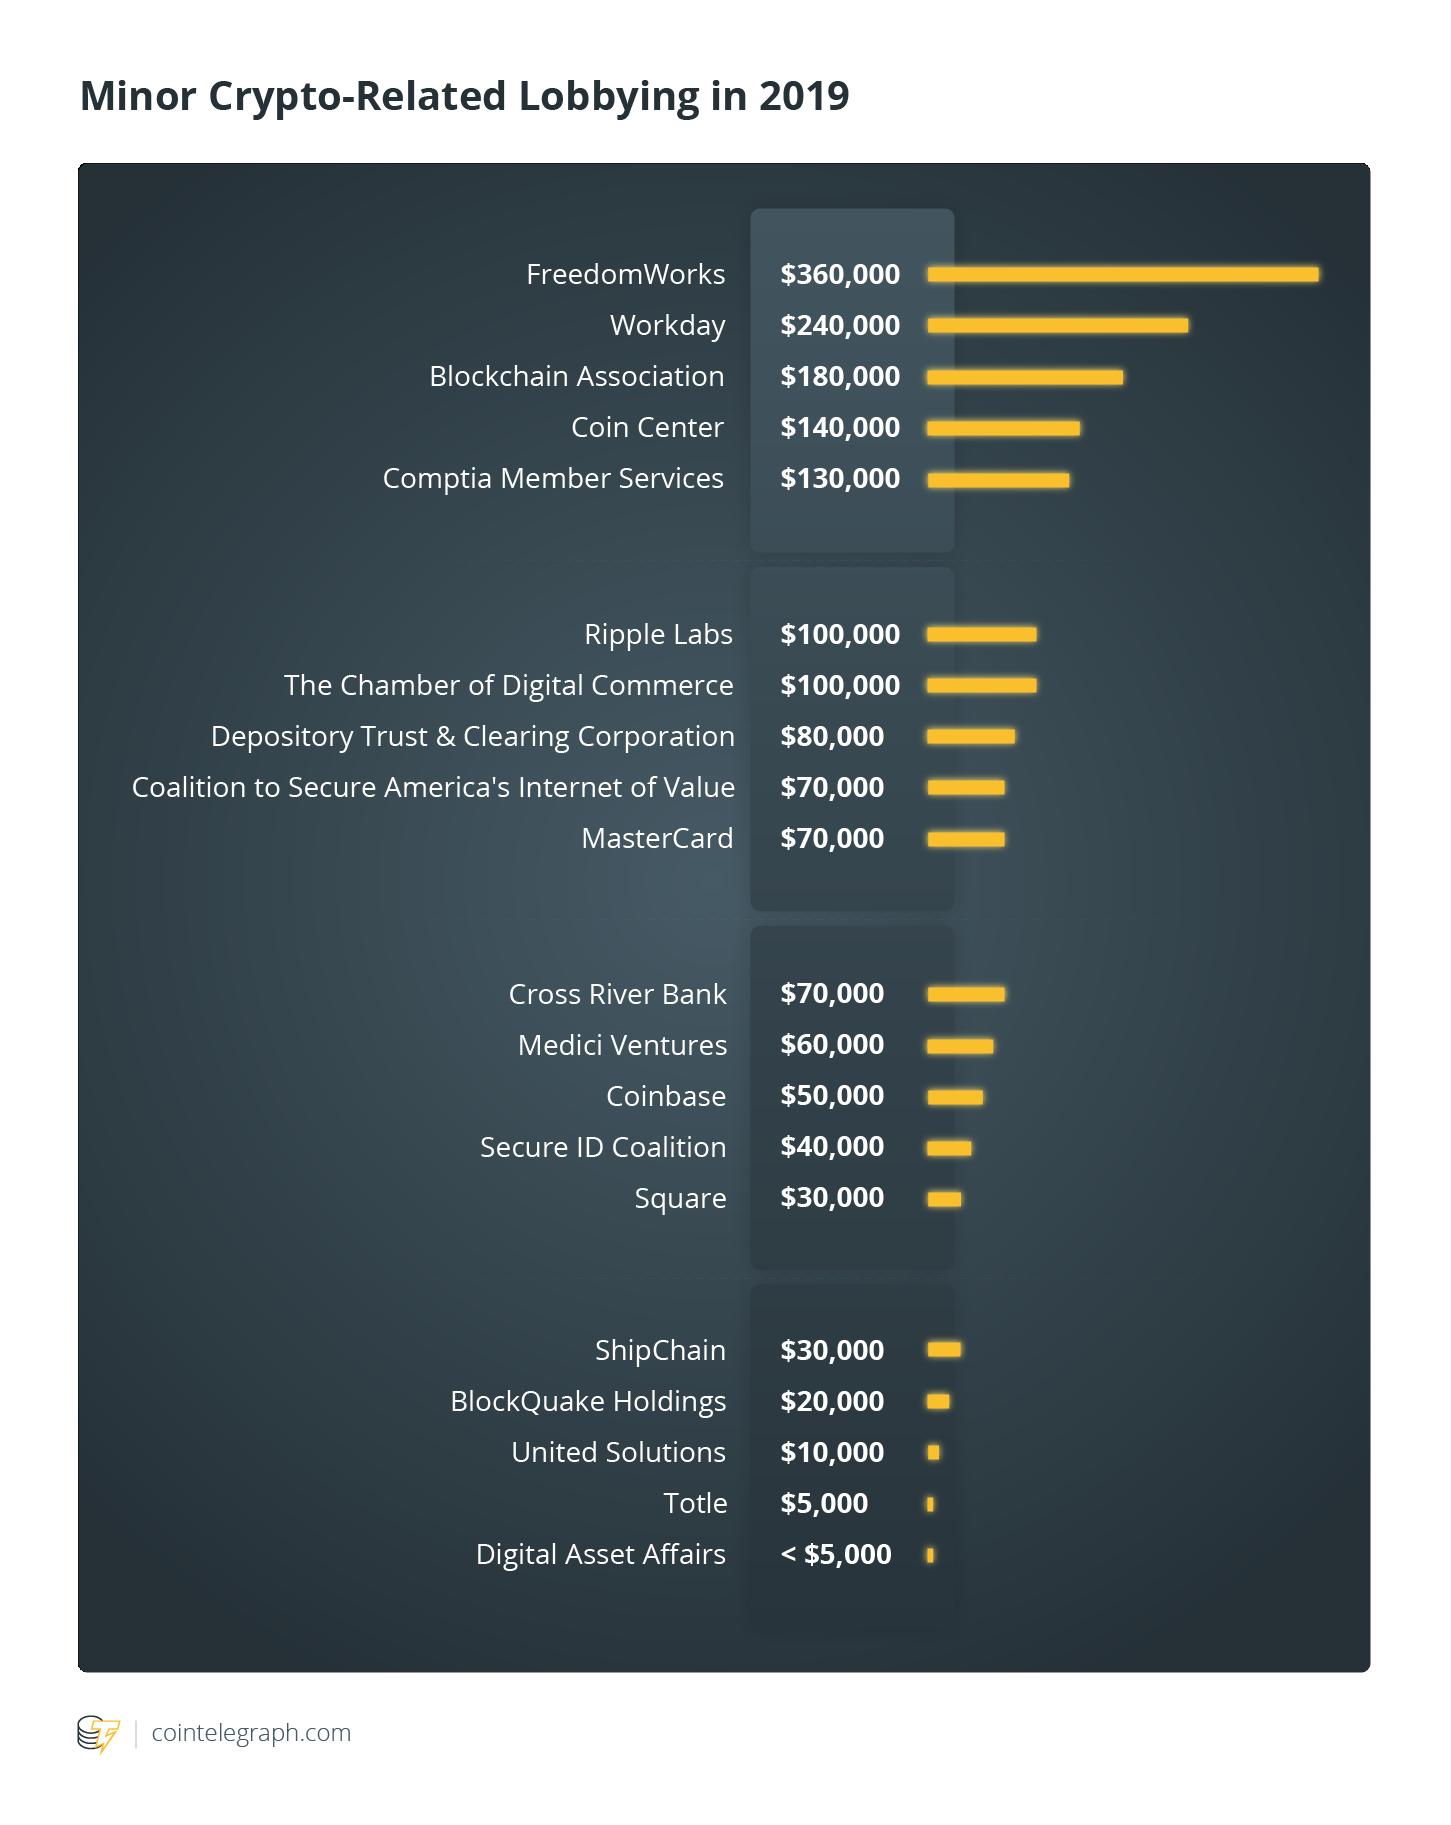 Minor Crypto-Related Lobbying in 2019